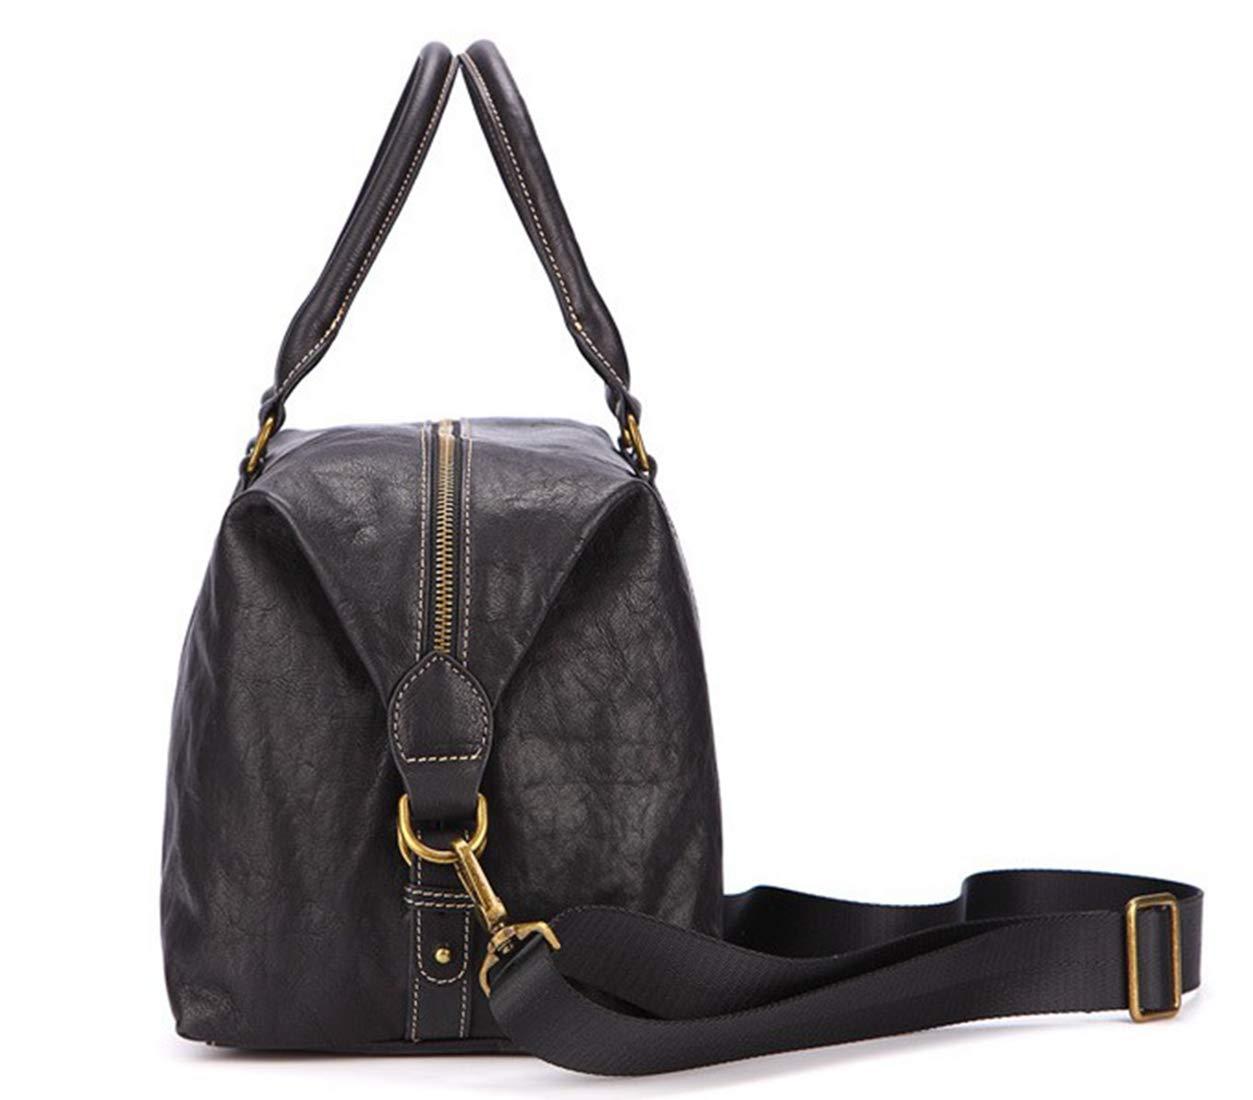 Color : Black RABILTY Portable Travel Bag Shoulder Diagonal First Layer Leather Business Travel Bag